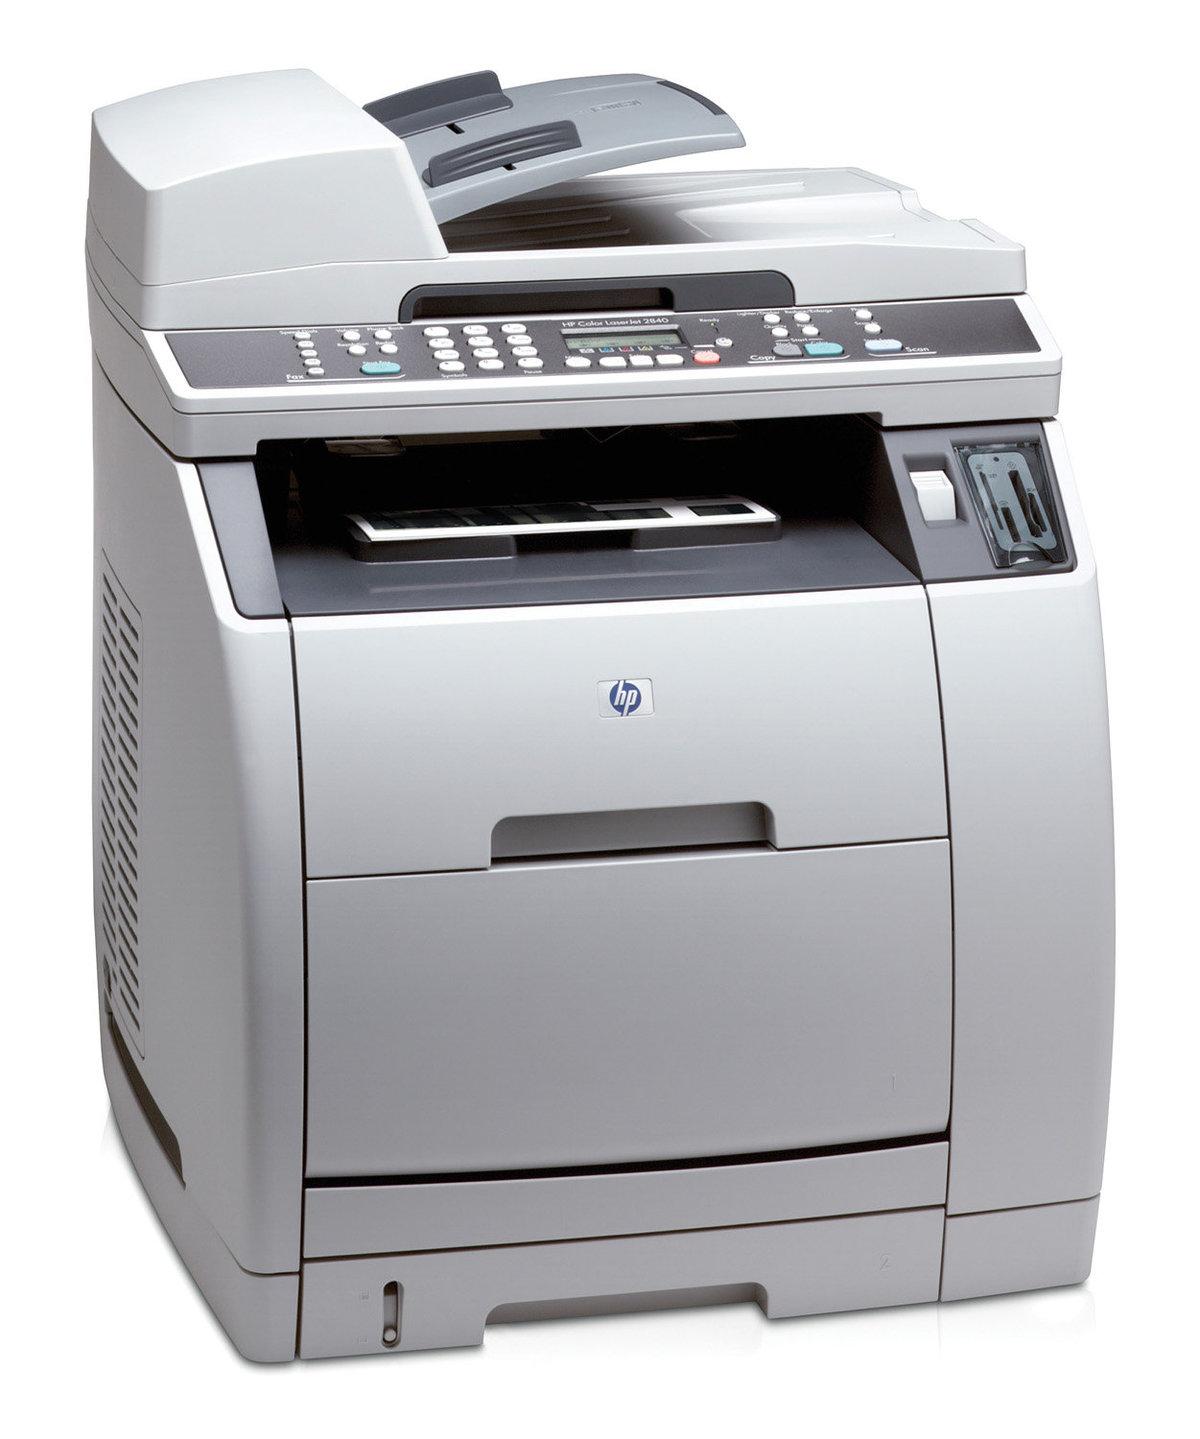 HP Colour LaserJet 2840 All-in-One series Printer / Fax1 / Scanner / Copier  (Q3950A#ABU) | BT Shop